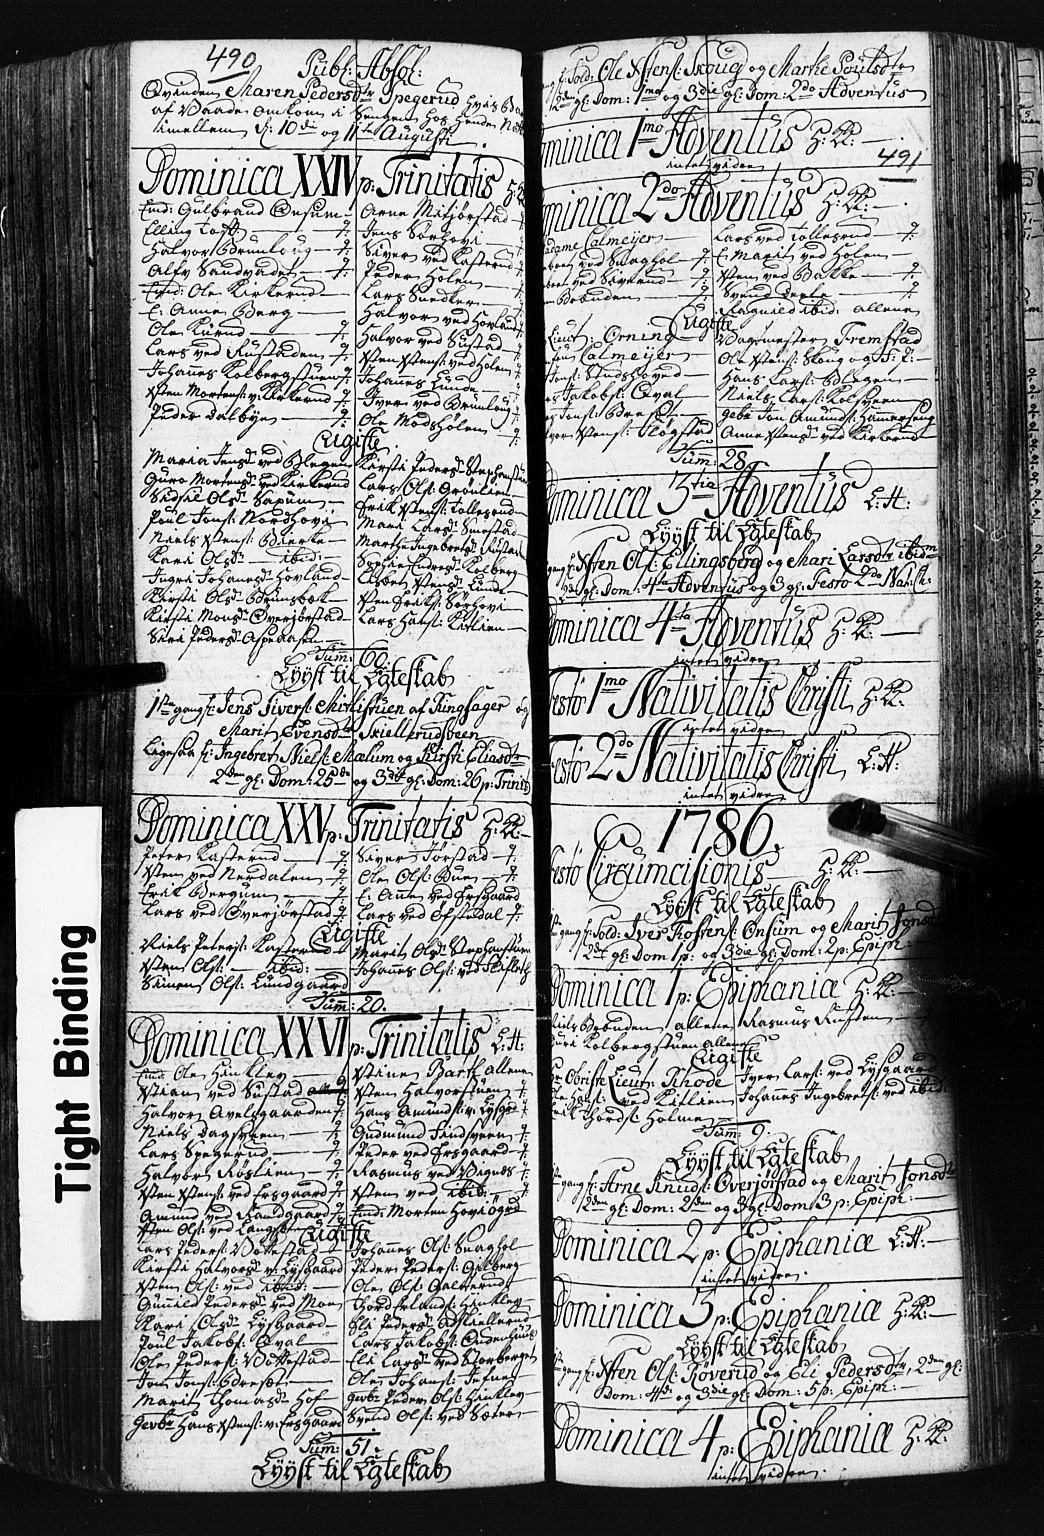 SAH, Fåberg prestekontor, Klokkerbok nr. 3, 1768-1796, s. 490-491